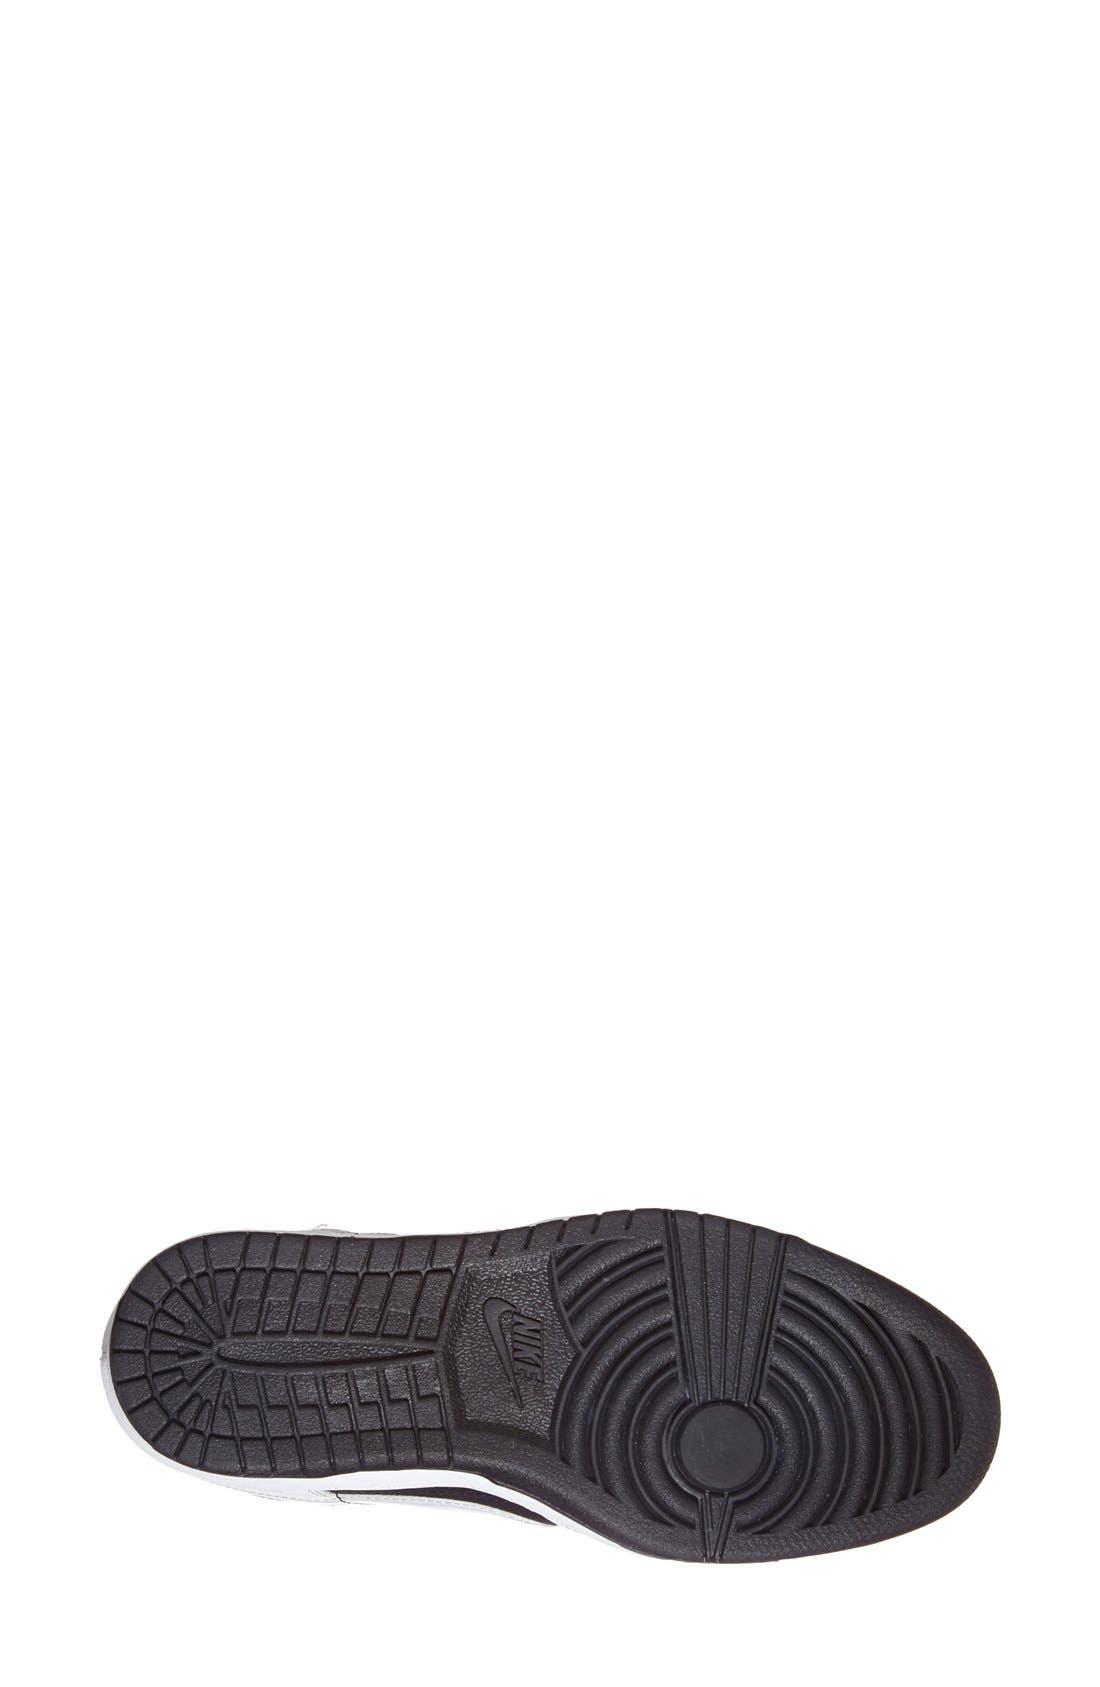 ,                             'Dunk Sky Hi - Essential' Wedge Sneaker,                             Alternate thumbnail 12, color,                             007